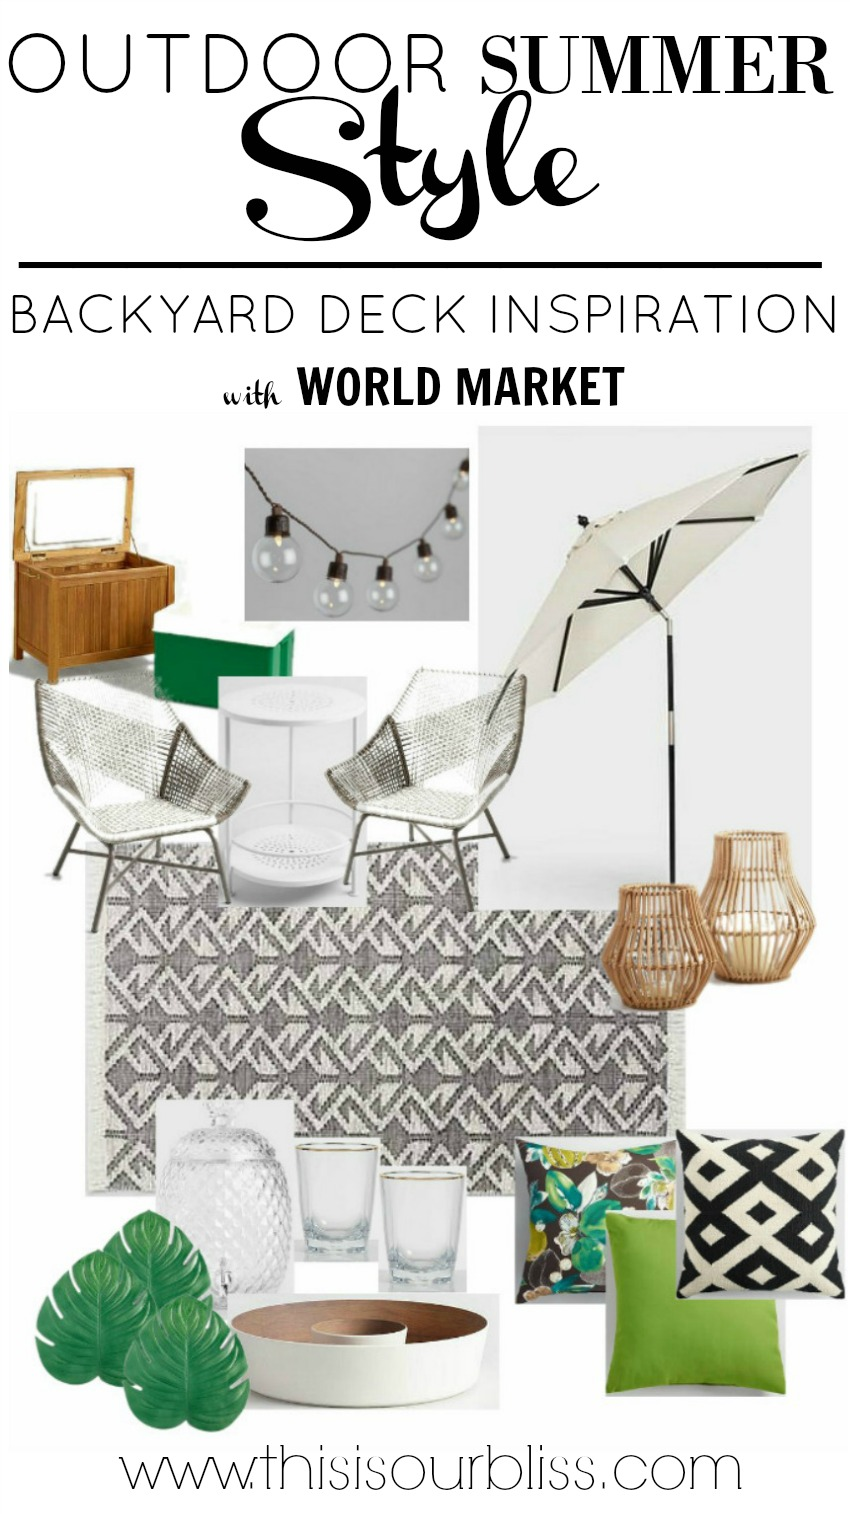 Outdoor Inspiration | Backyard Deck Makeover Ideas from World Market | www,thisisourbliss.com